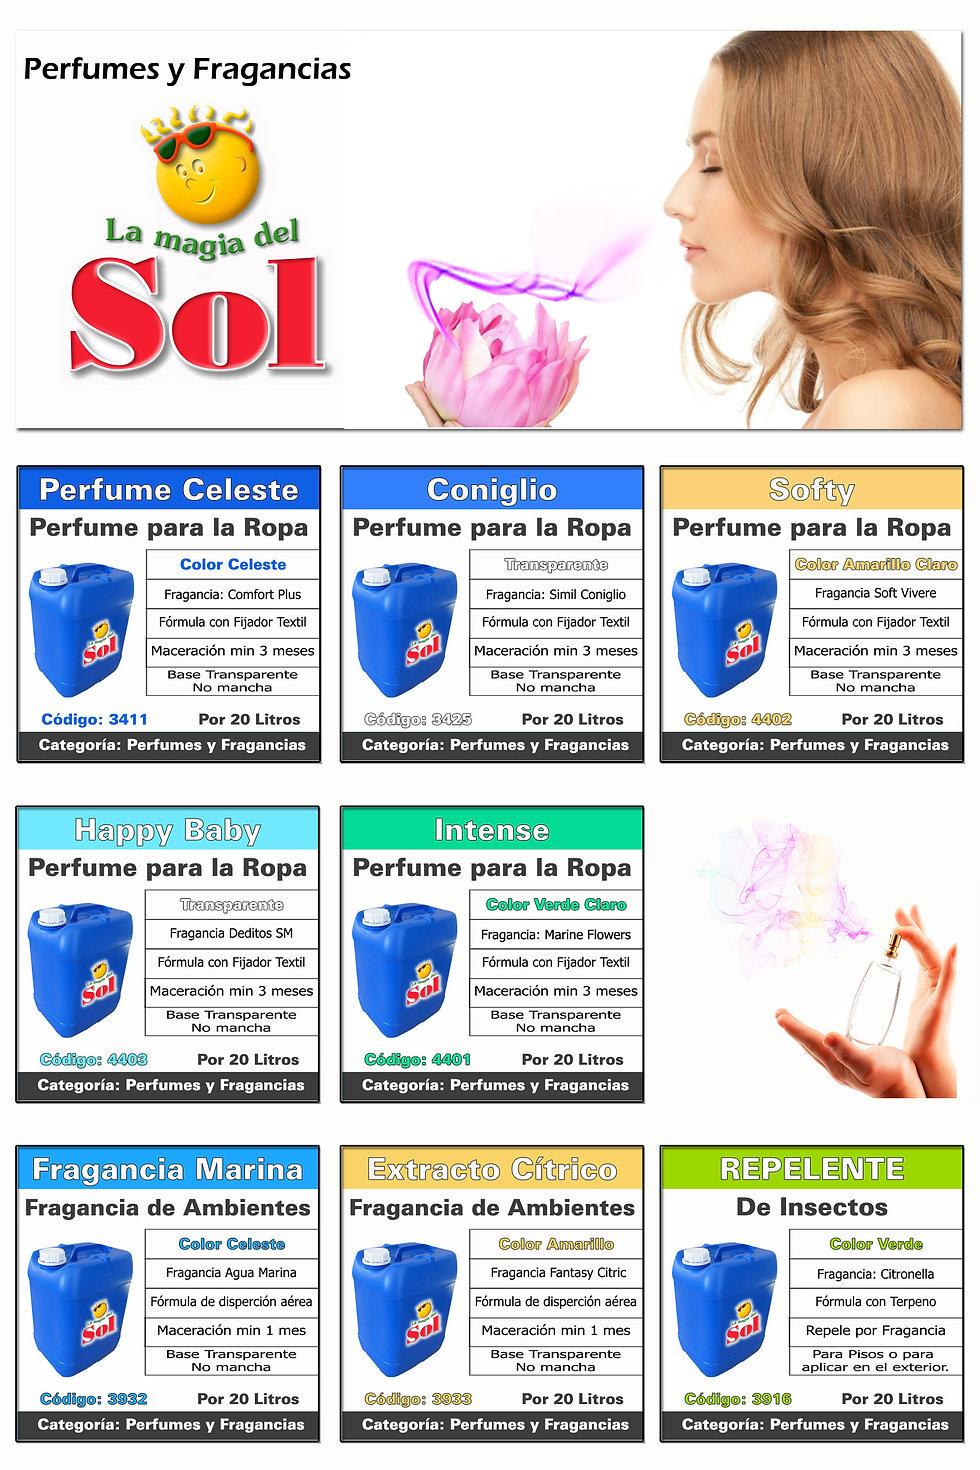 4 Perfumes y Fragancias GENERAL.jpg